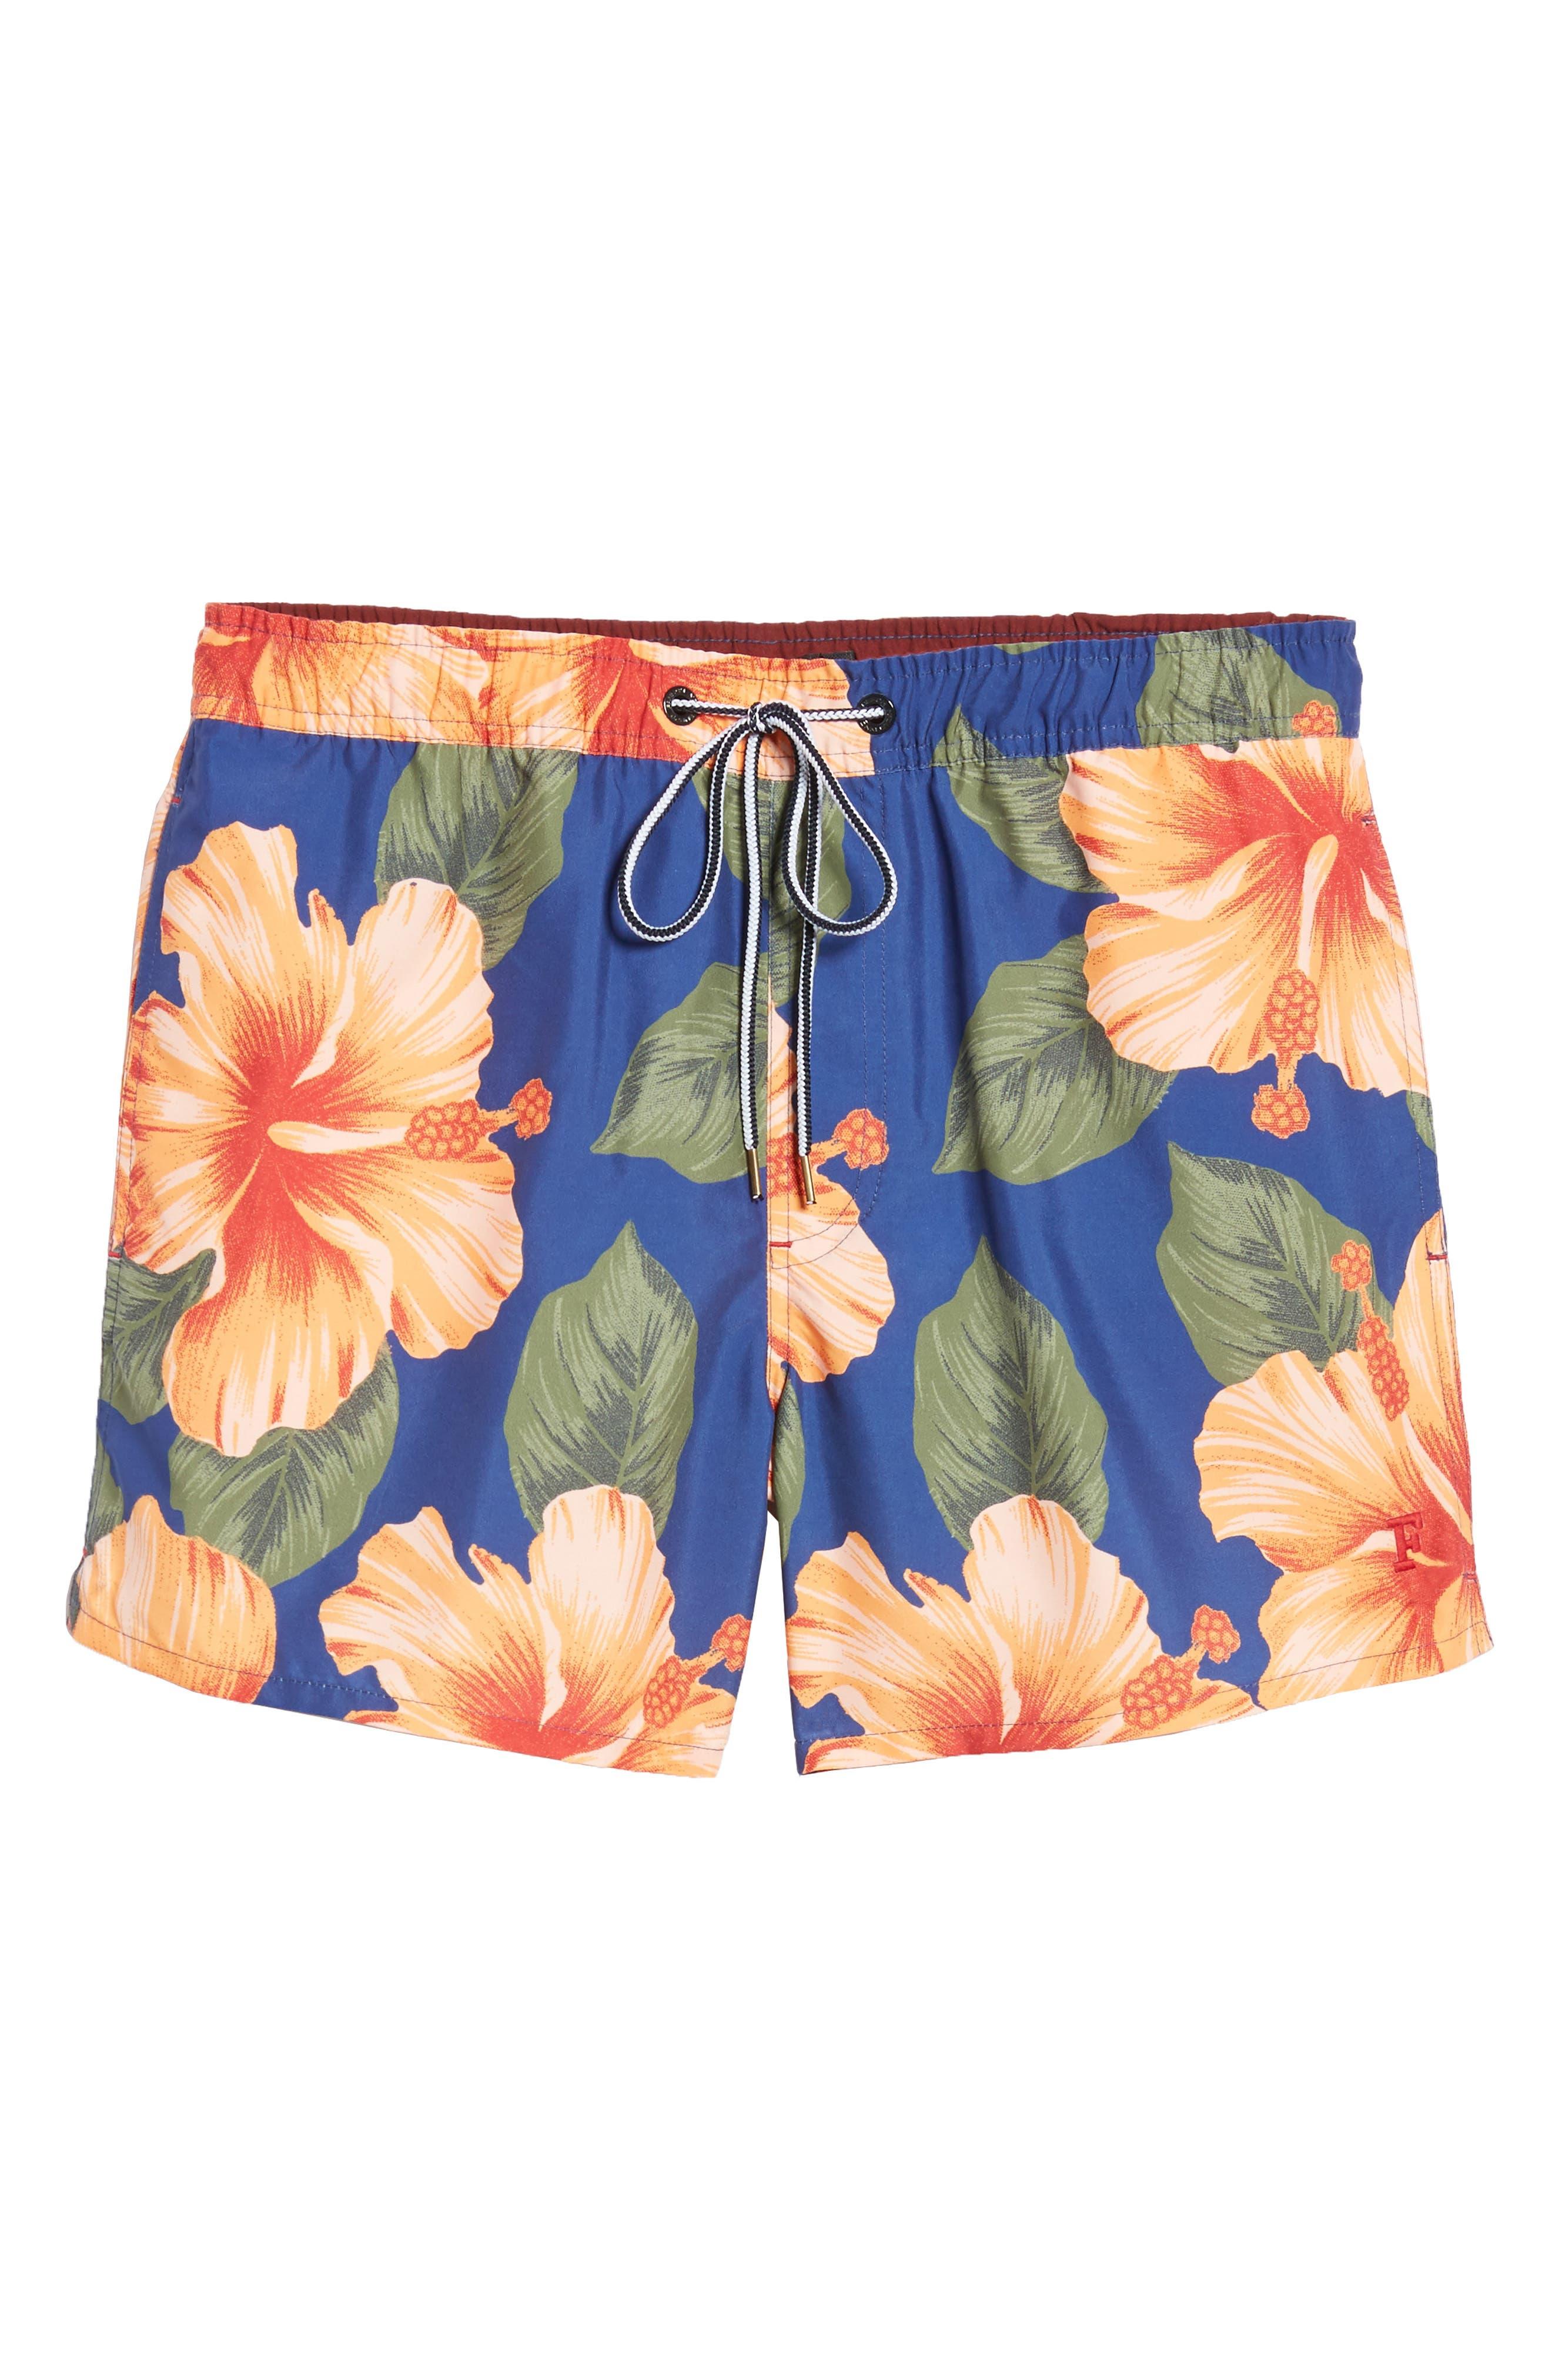 Wela Hawaiian Slim Fit Swim Trunks,                             Alternate thumbnail 6, color,                             DEEP COBALT